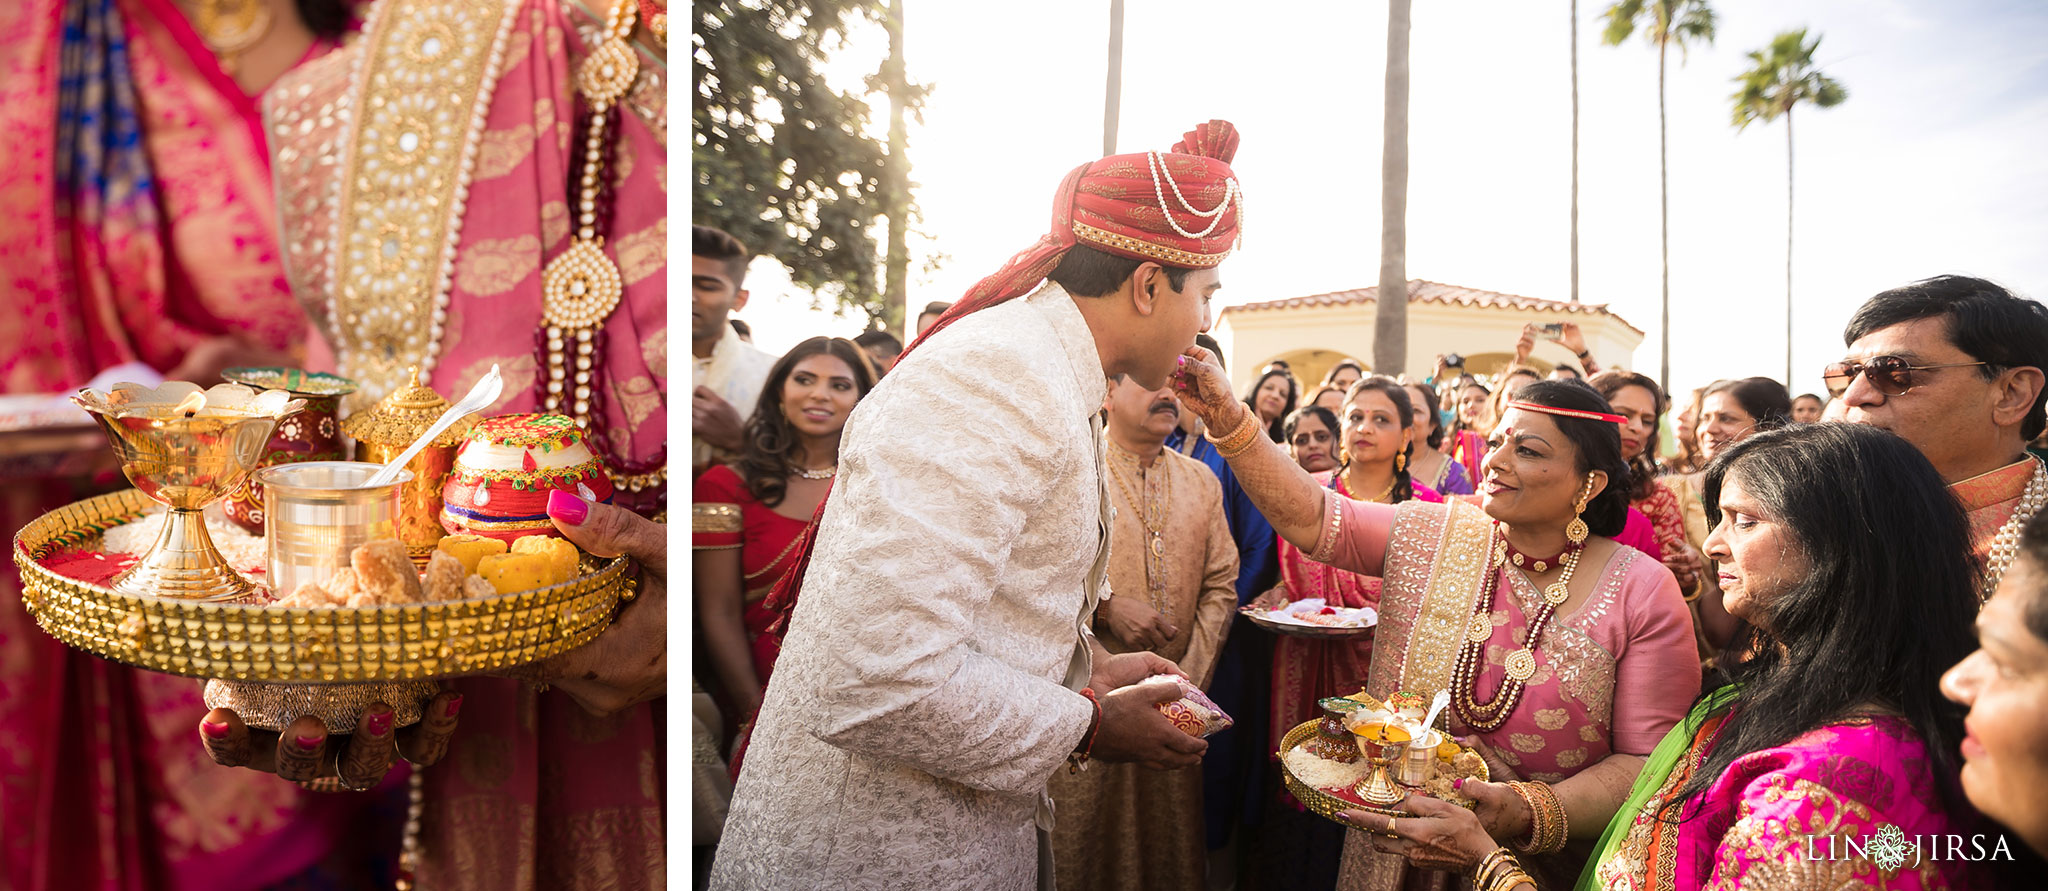 20 ritz carlton laguna niguel baraat indian wedding photography